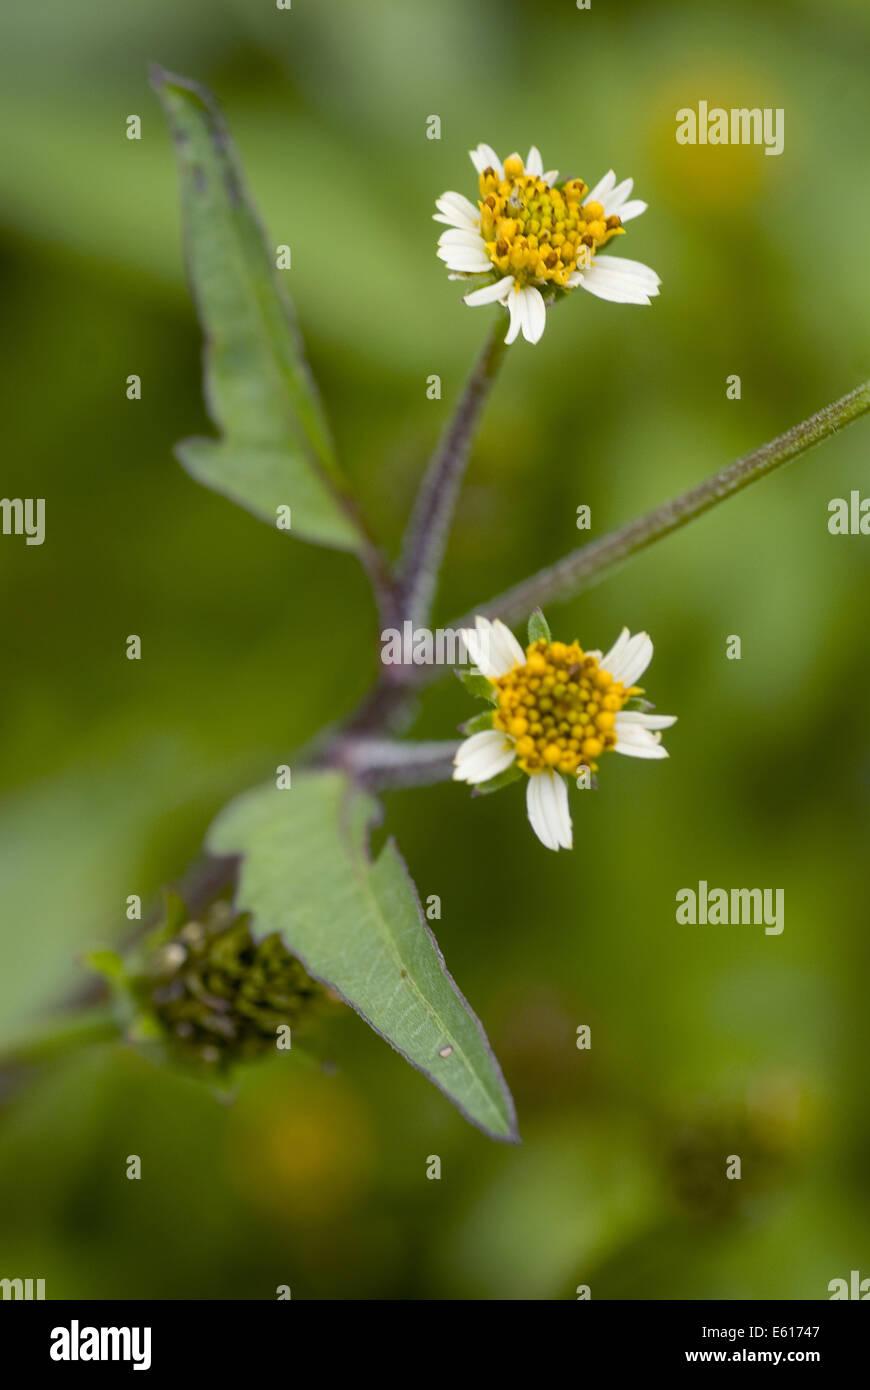 hairy beggarticks, bidens pilosa - Stock Image